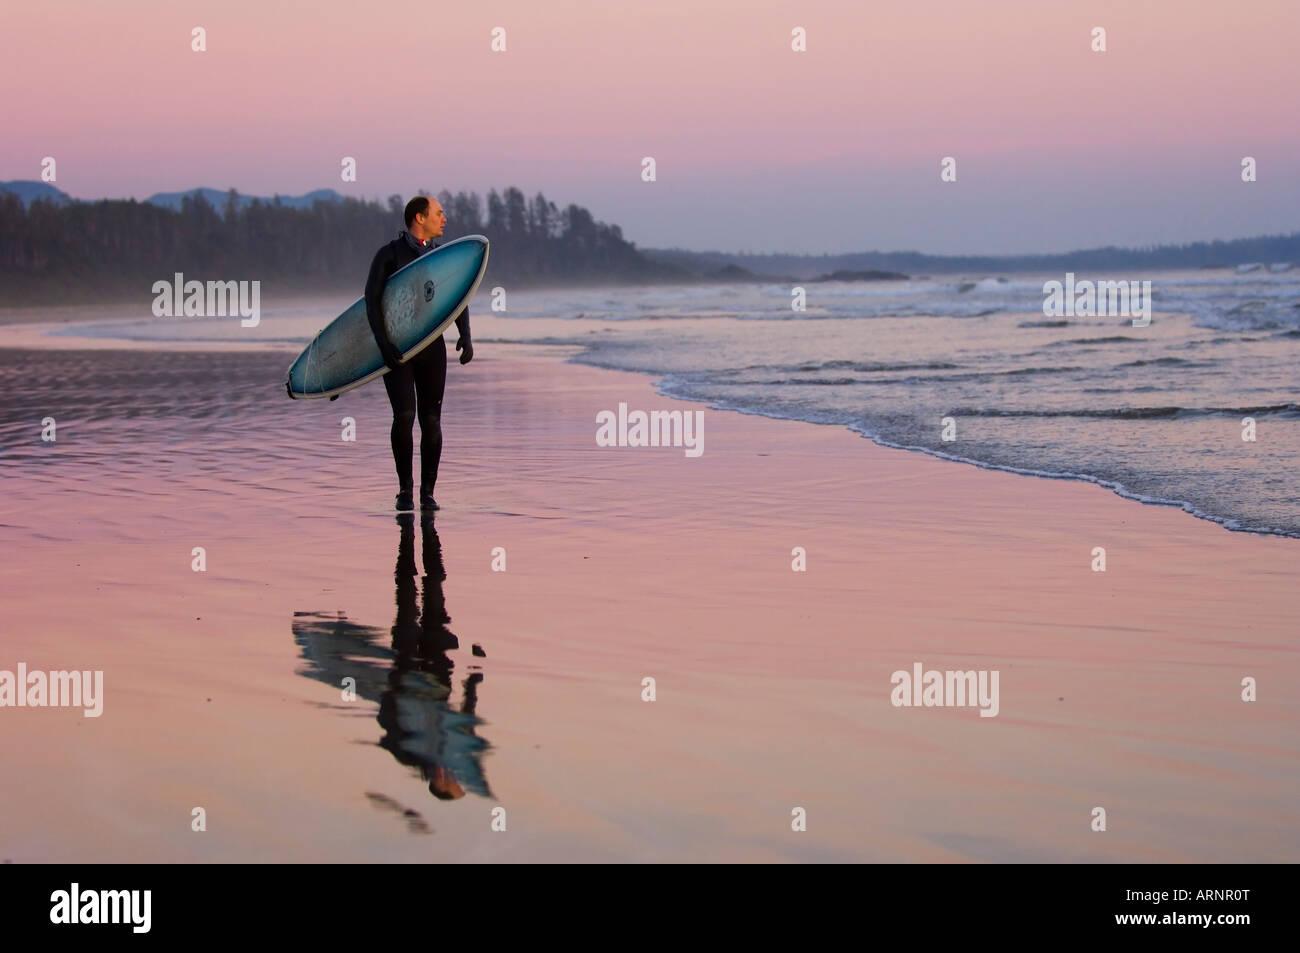 Surfer geht Küstenlinie, Pacific Rim National Park, Long Beach, Vancouver Island, British Columbia, Kanada. Stockfoto